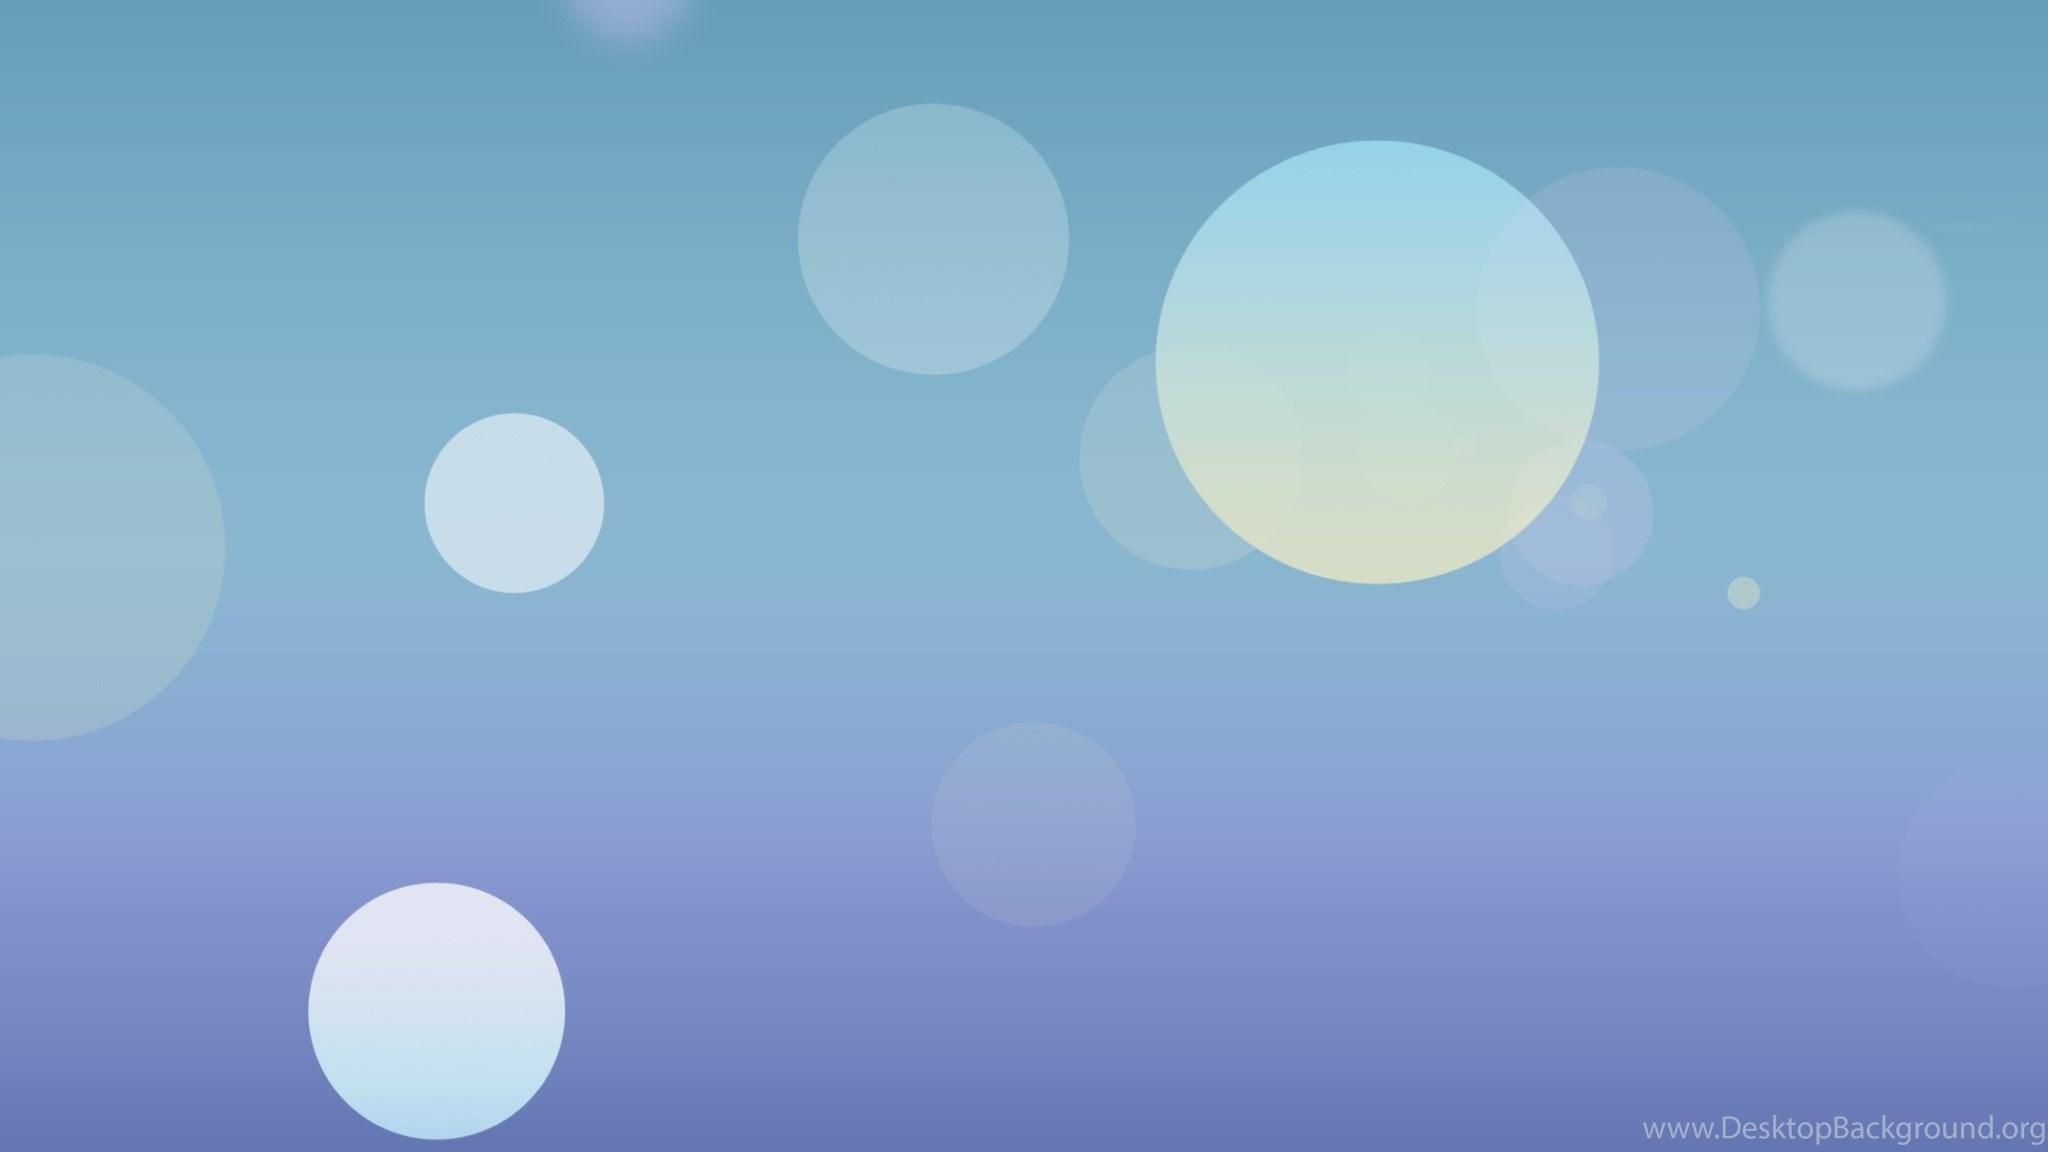 Iphone Ios 7 Wallpapers Hd Desktop Background